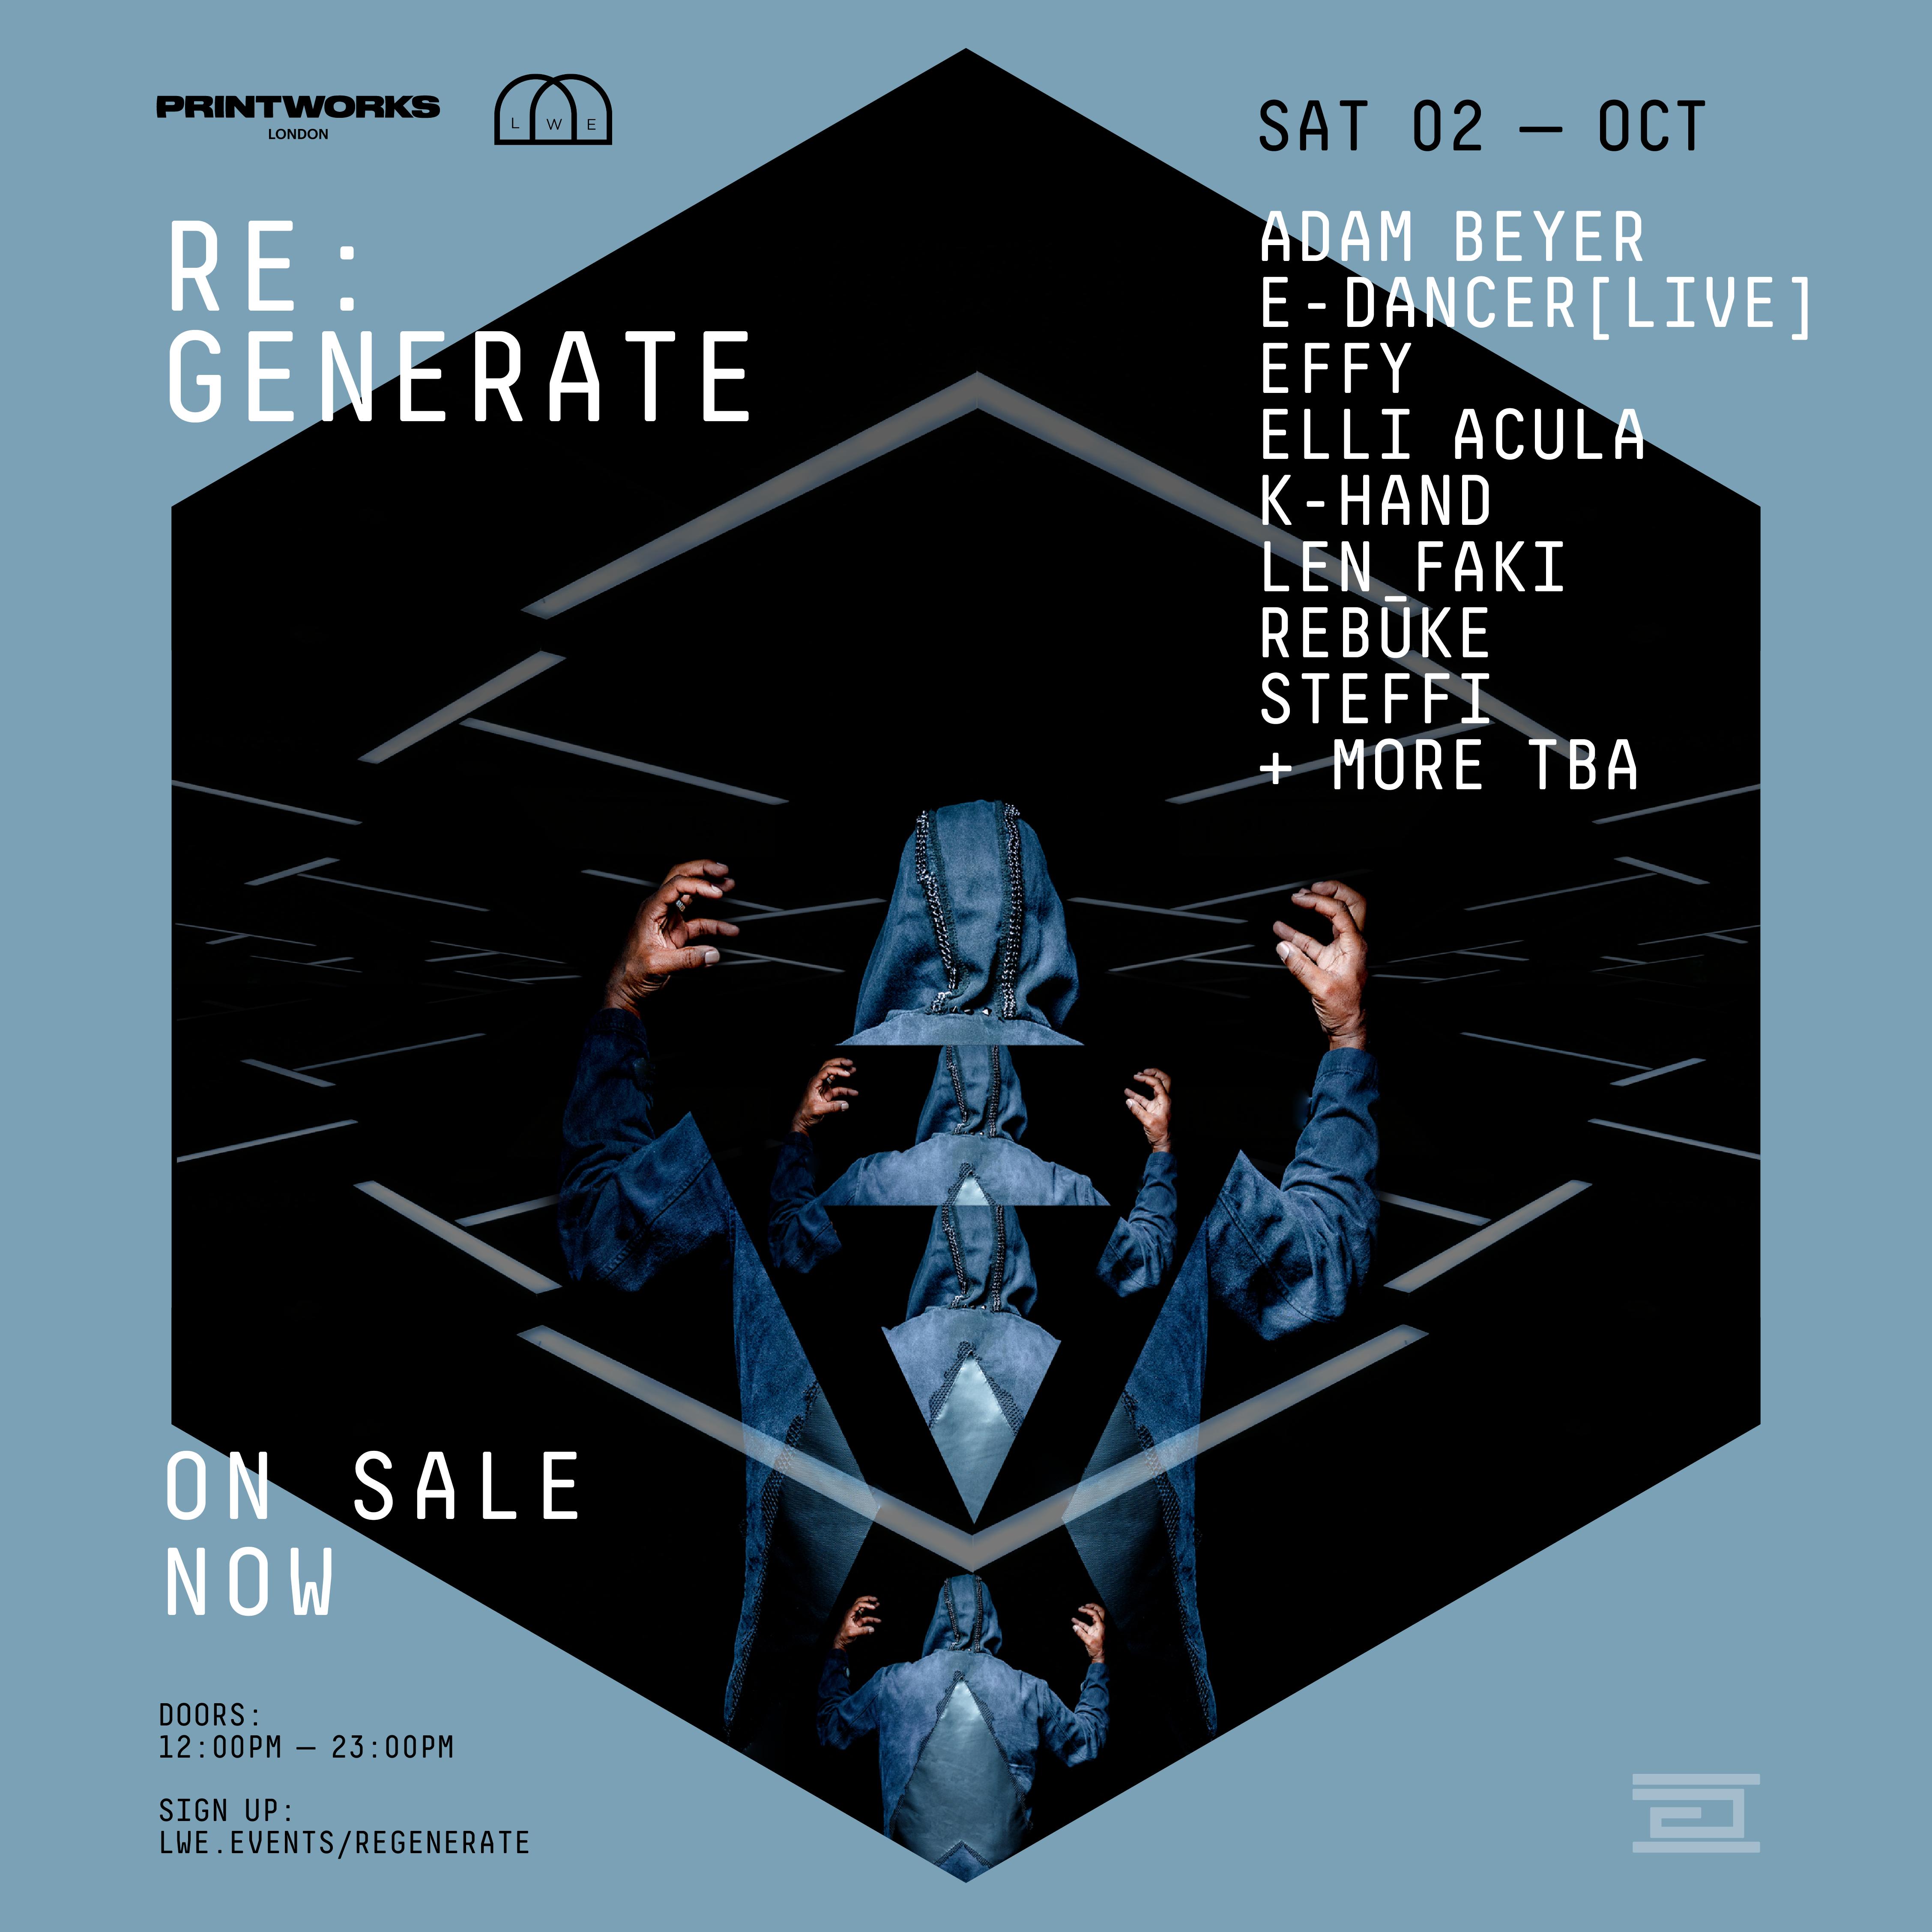 Re:Generate - Adam Beyer & more